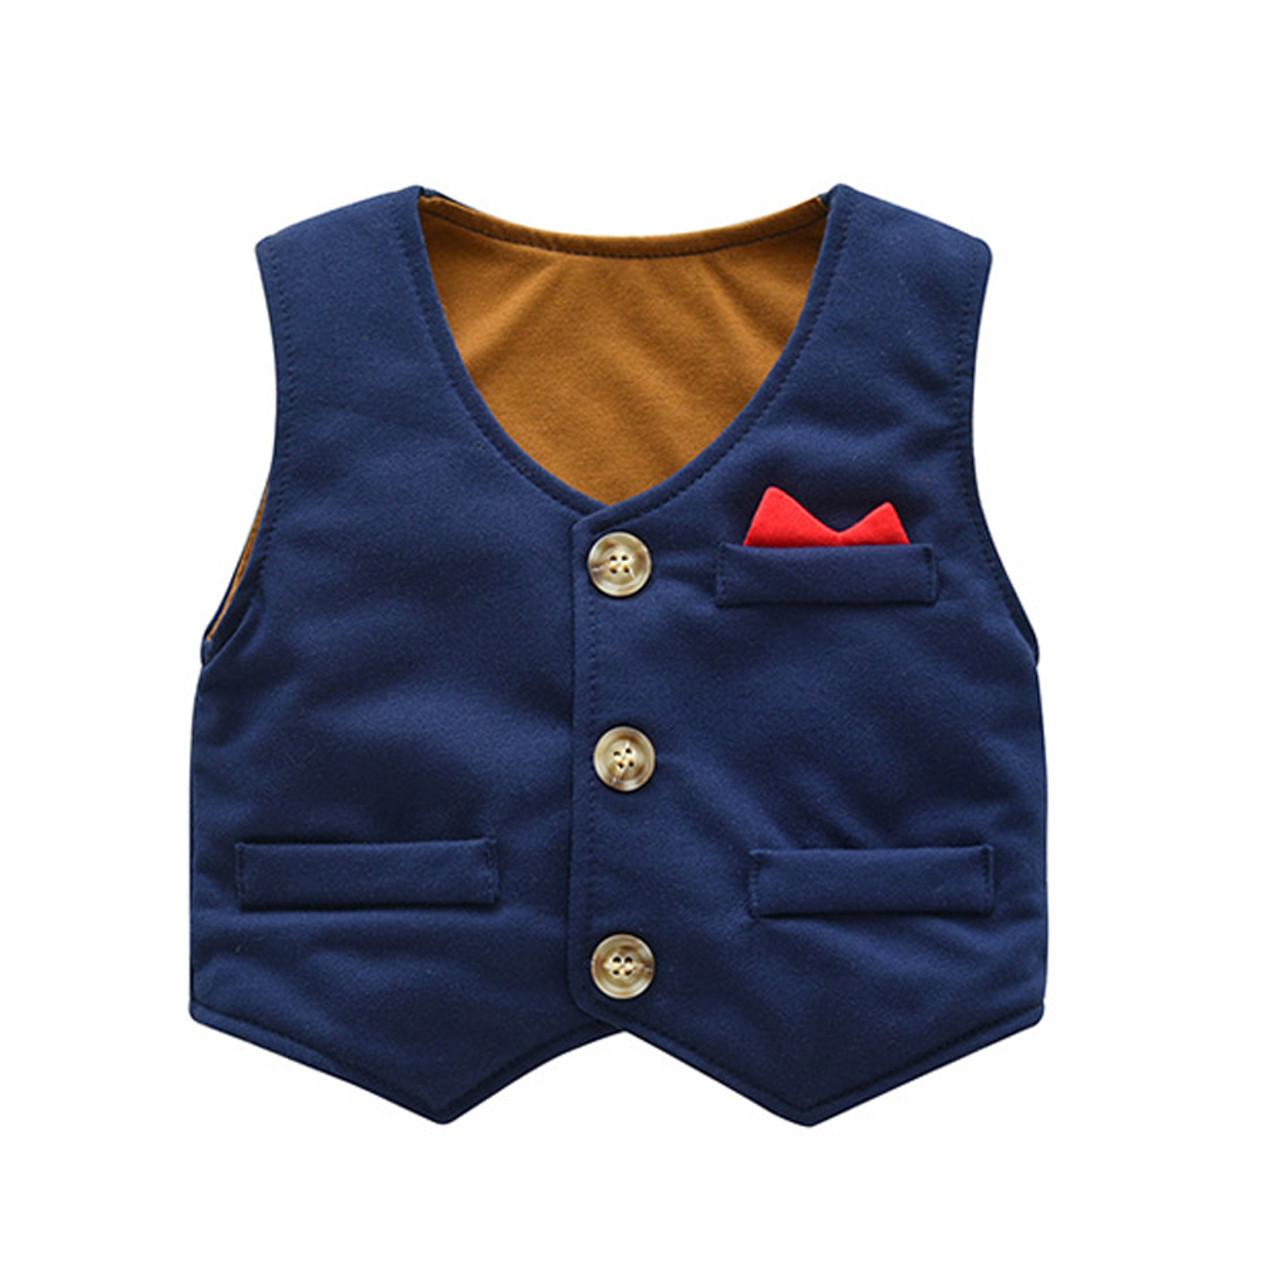 22cc1603e6f9 ... IYEAL Baby Boy Clothes 3 Pieces Suits Vest + Tie Rompers + Pants Fashion  Gentleman Kids ...